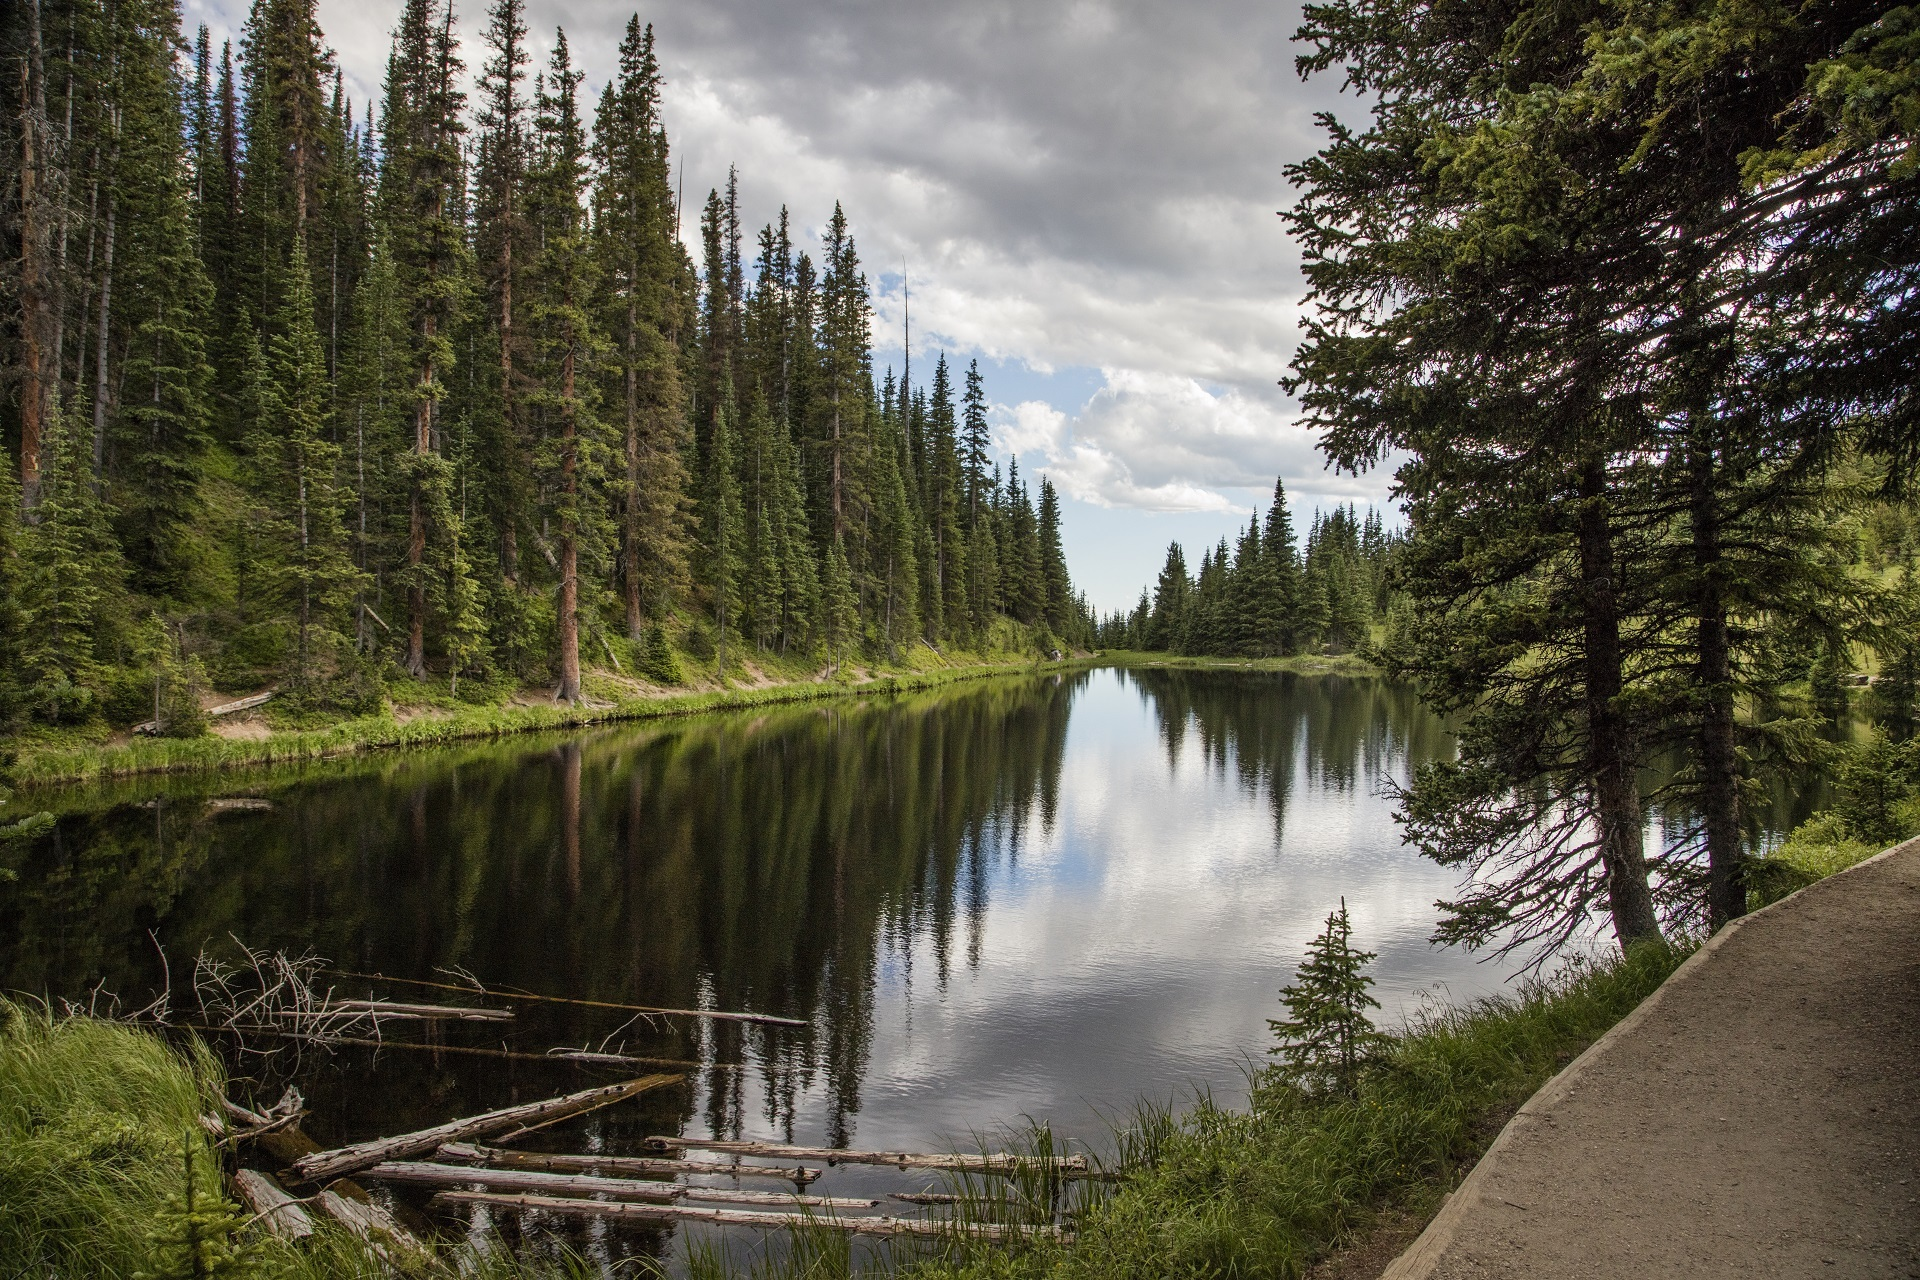 Lake irene photo